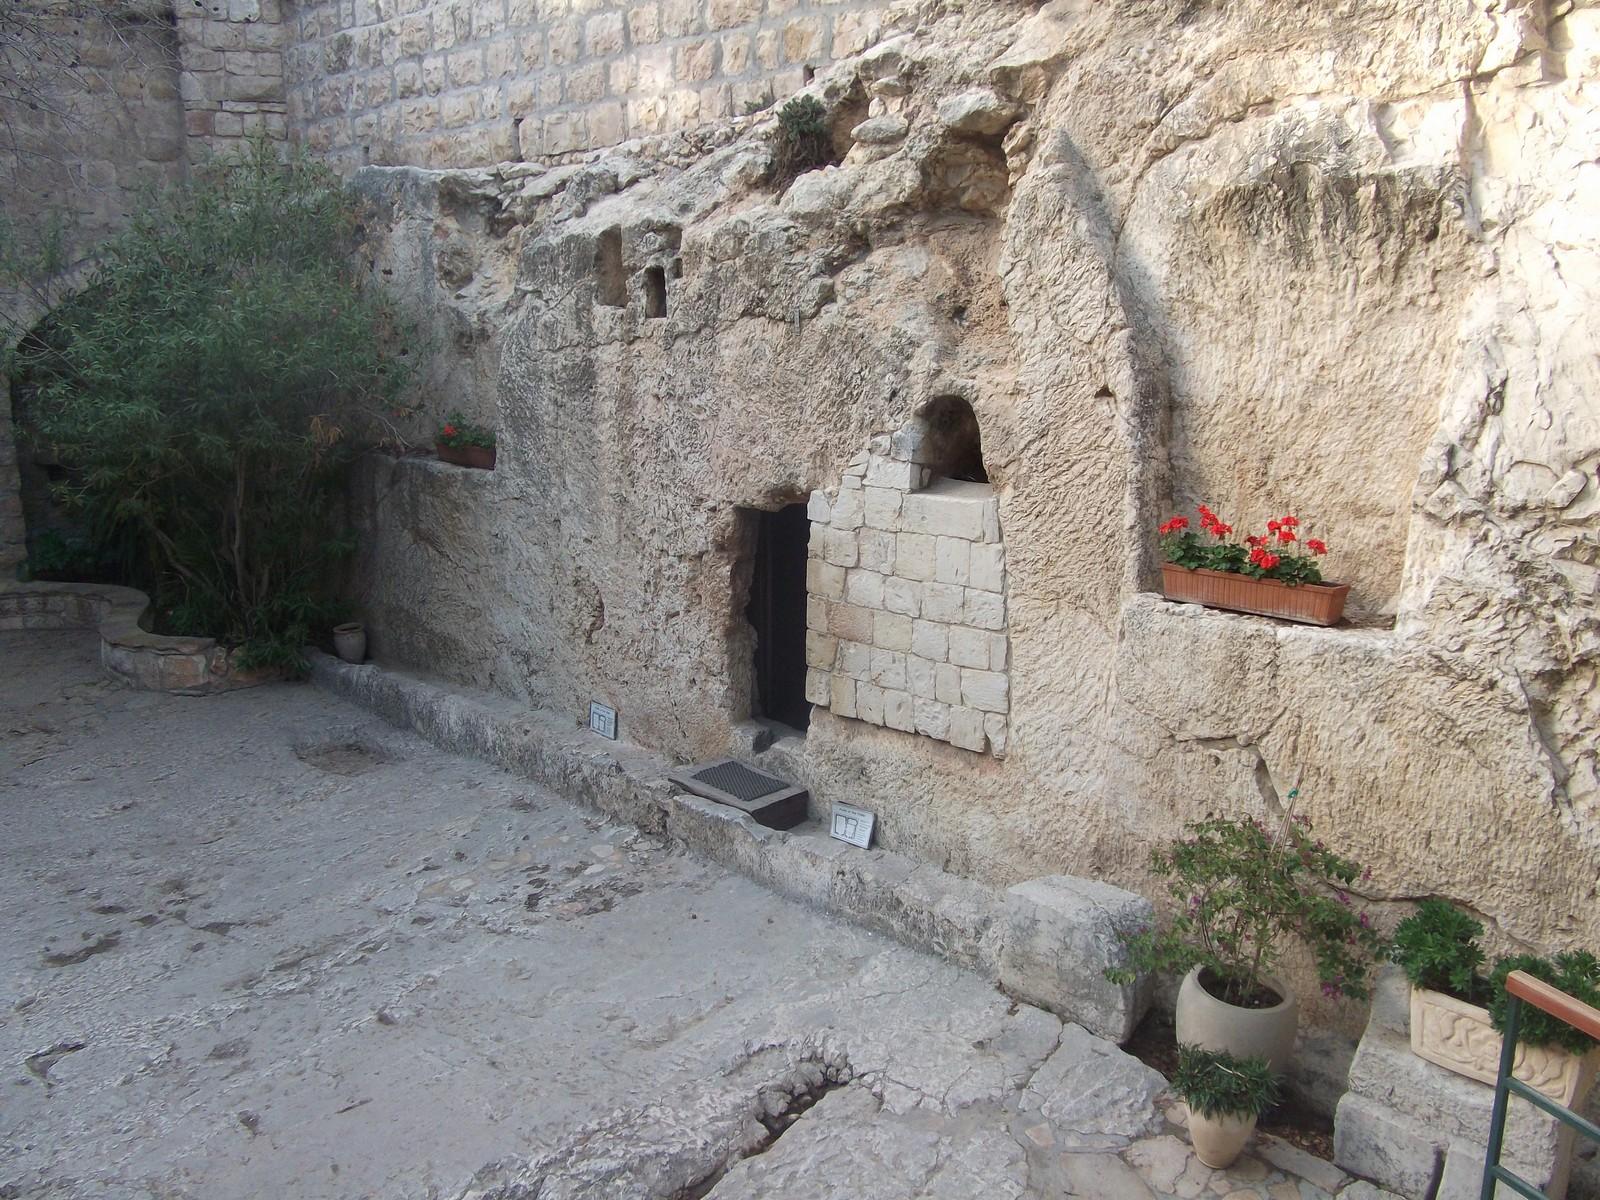 JUDICIARIO JUSTICA JARDIM DA BABILÔNIA, Túmulo de Jesus de Nazaré